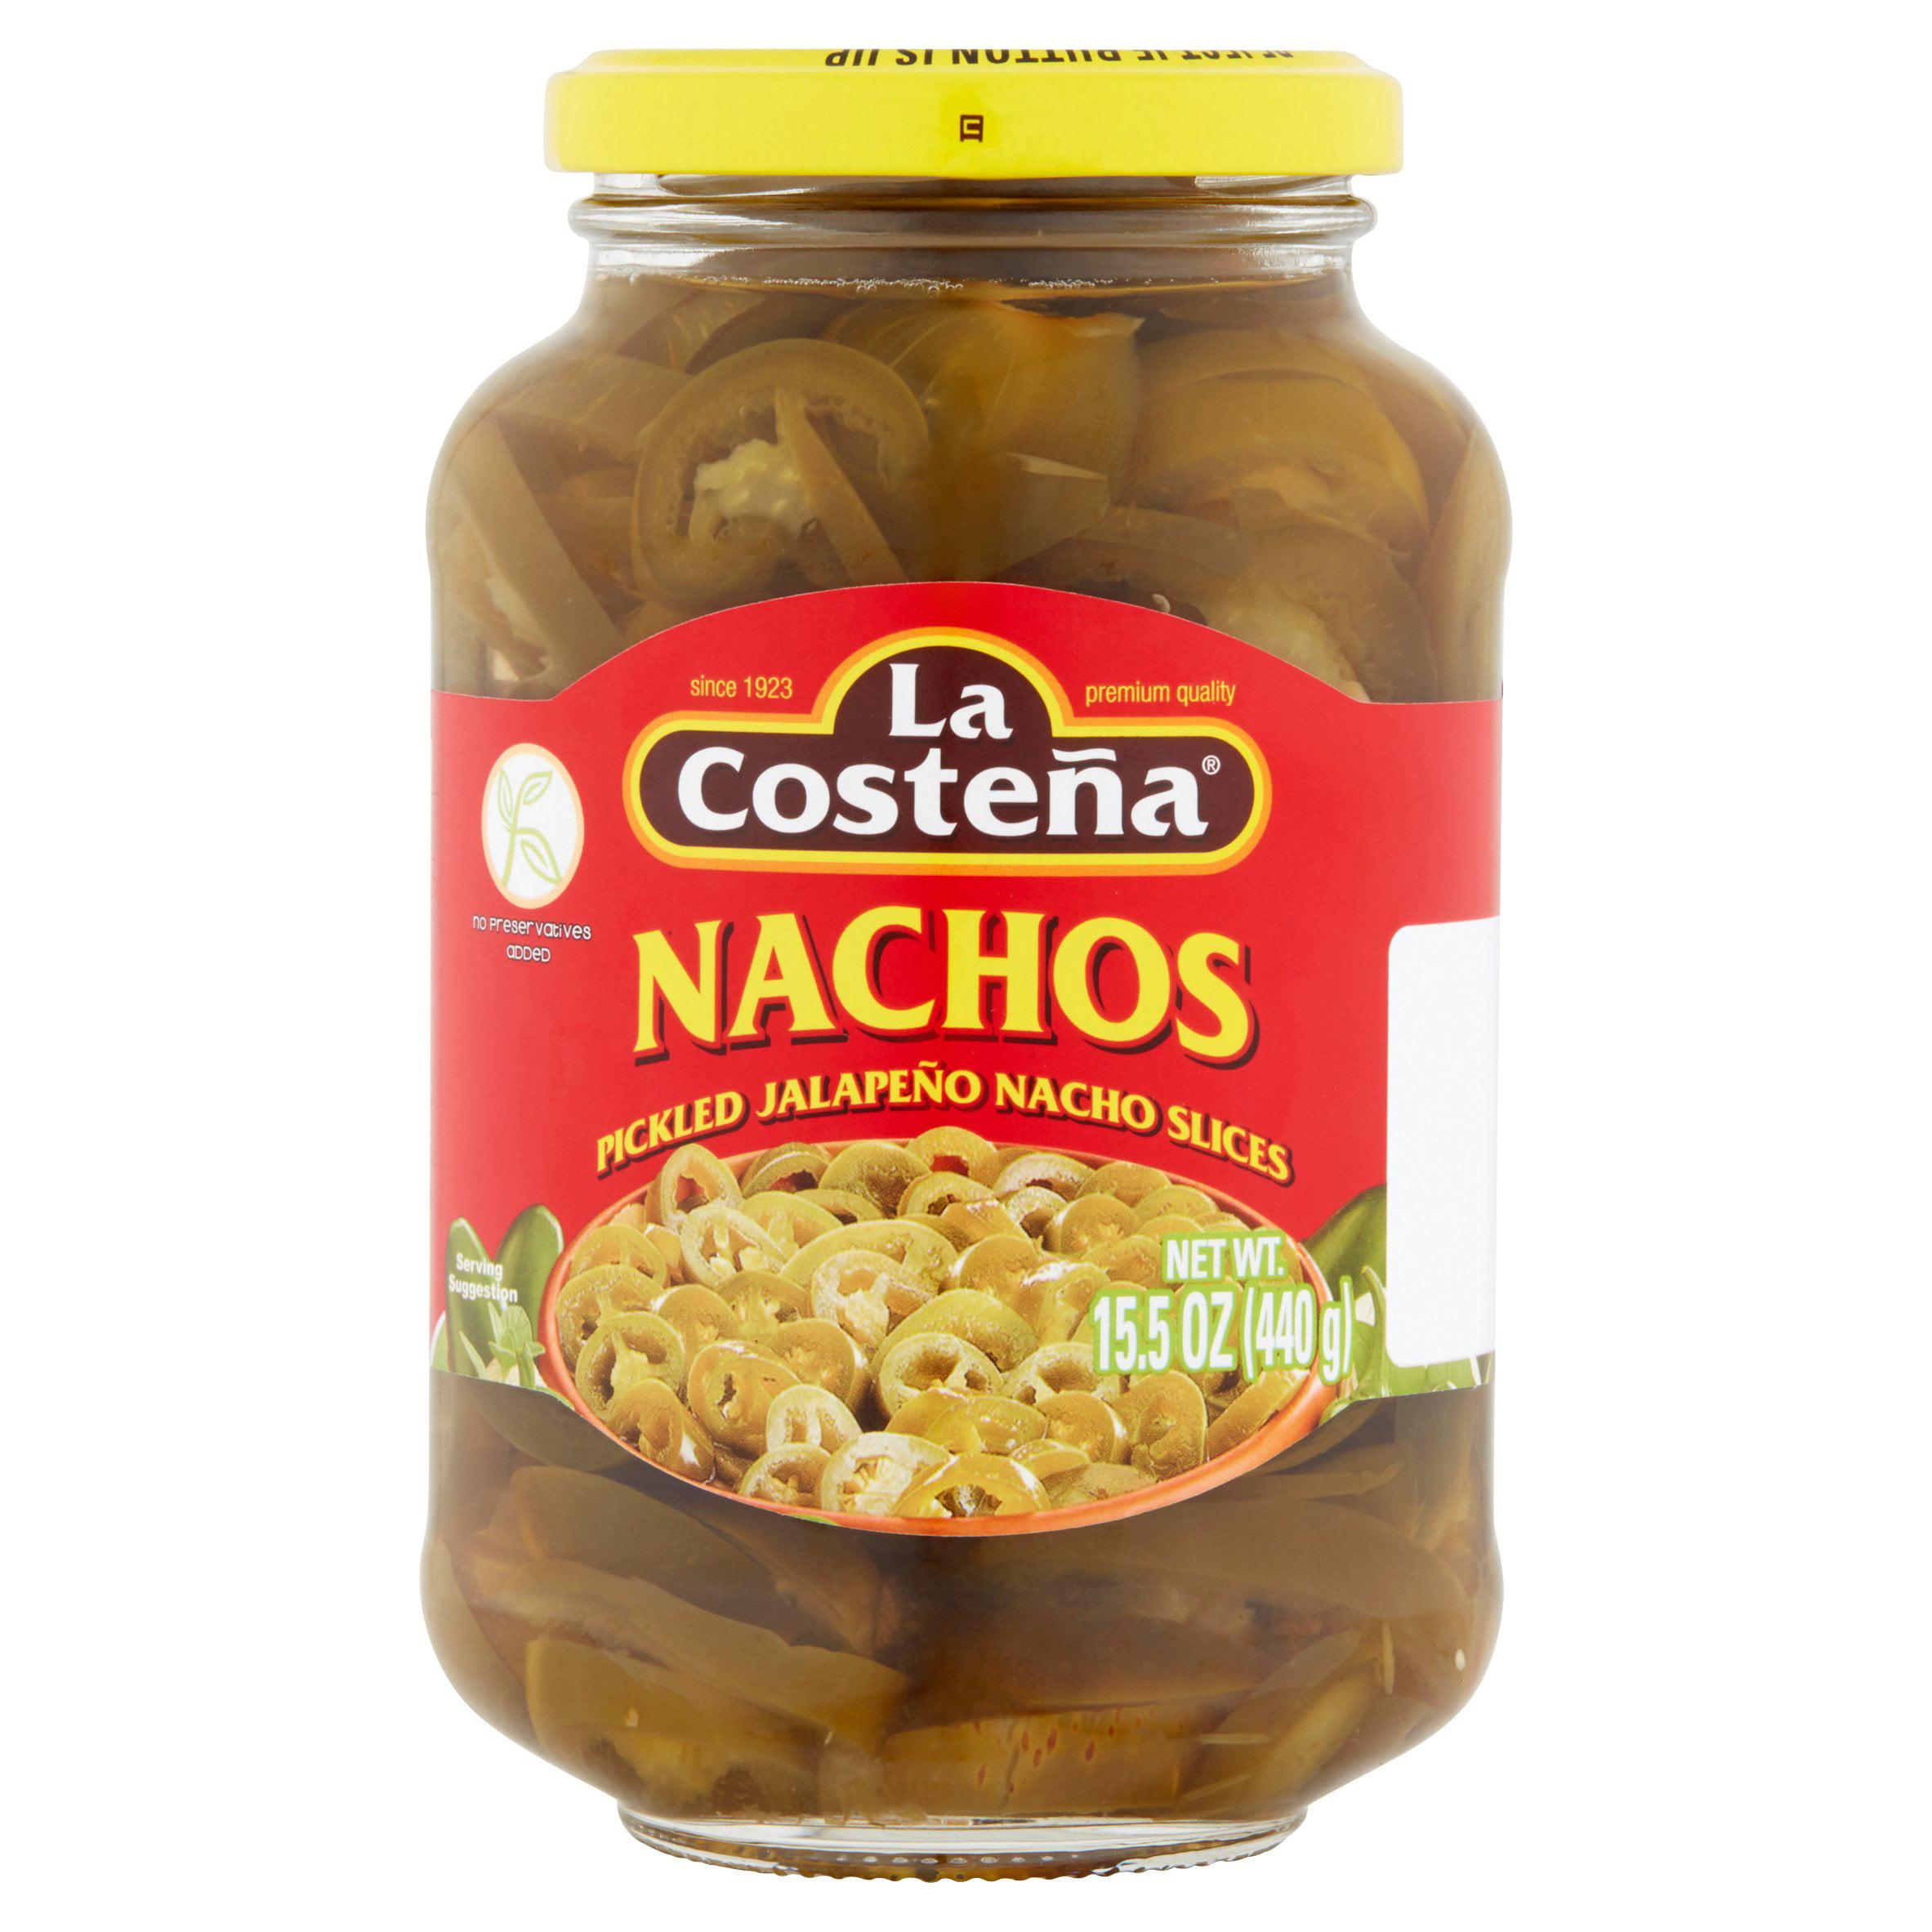 (6 Pack) La Costeña Pickled Jalapeño Nachos Slices, 15.5 oz